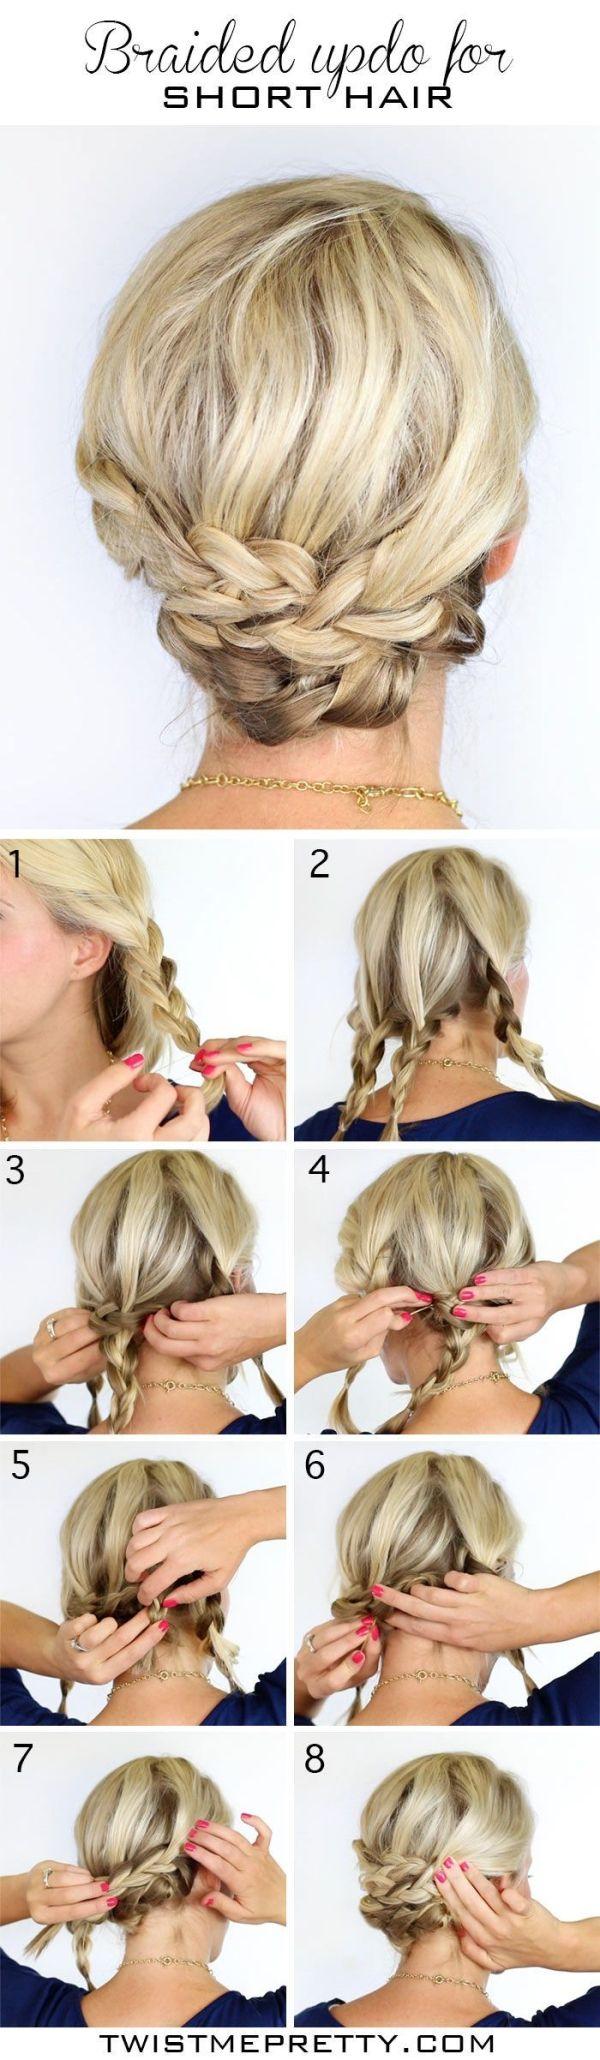 12 Pretty Braided Hairstyles For Short Hair Short Hair Updo Long Hair Styles Hair Styles